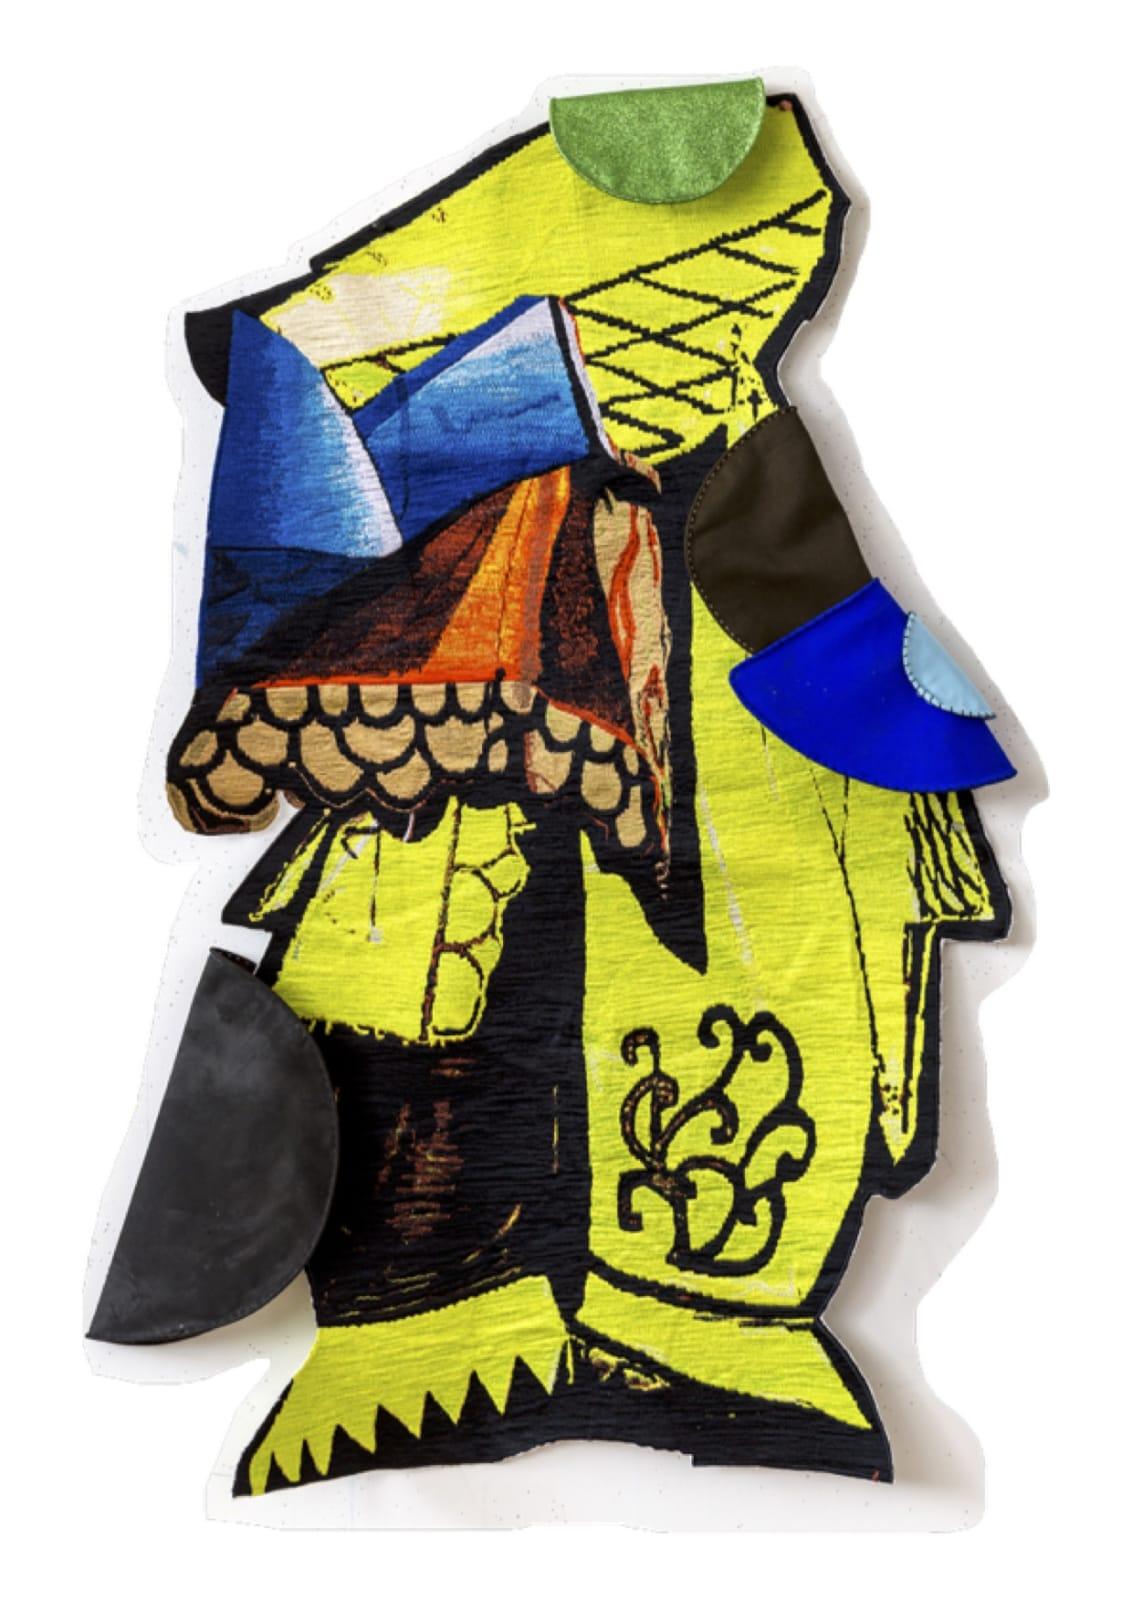 Sally Smart, Performance Assemblage (Yellow Chout), 2016